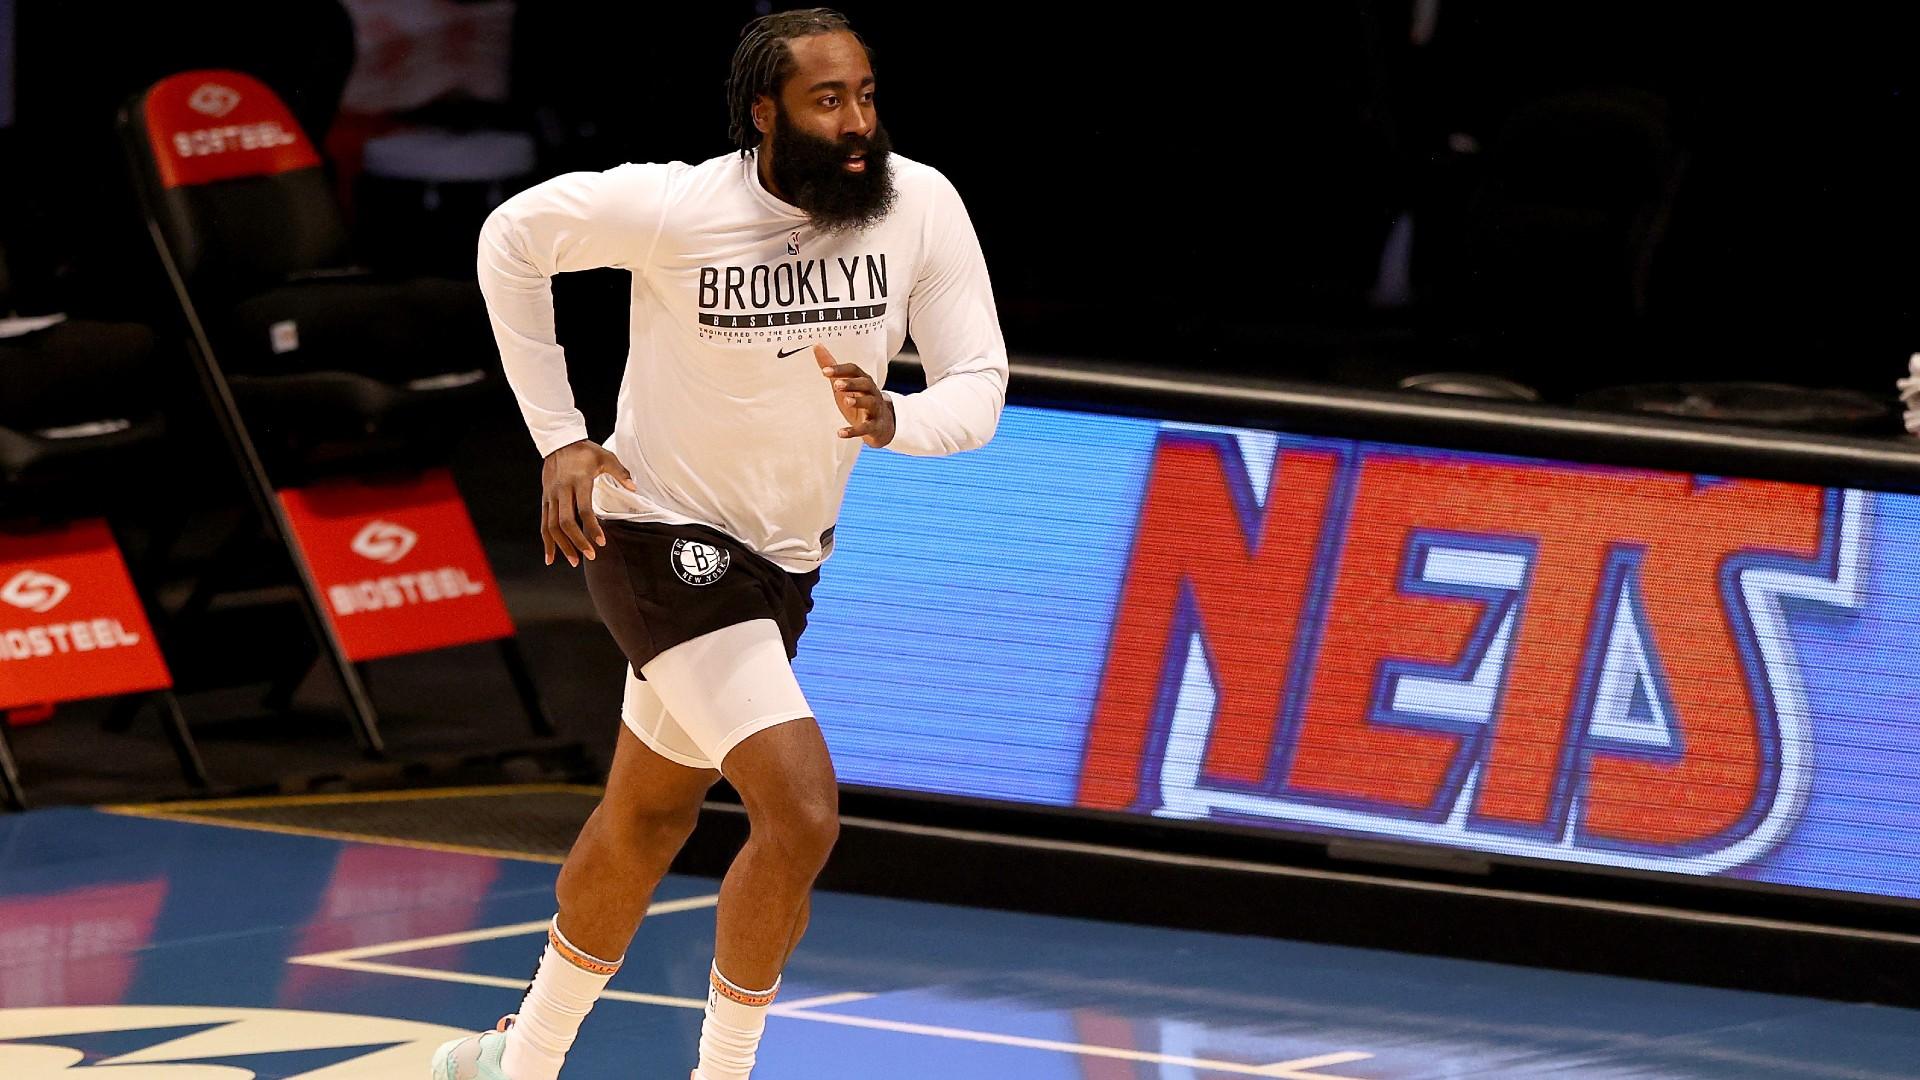 James Harden to make long-awaited Nets comeback